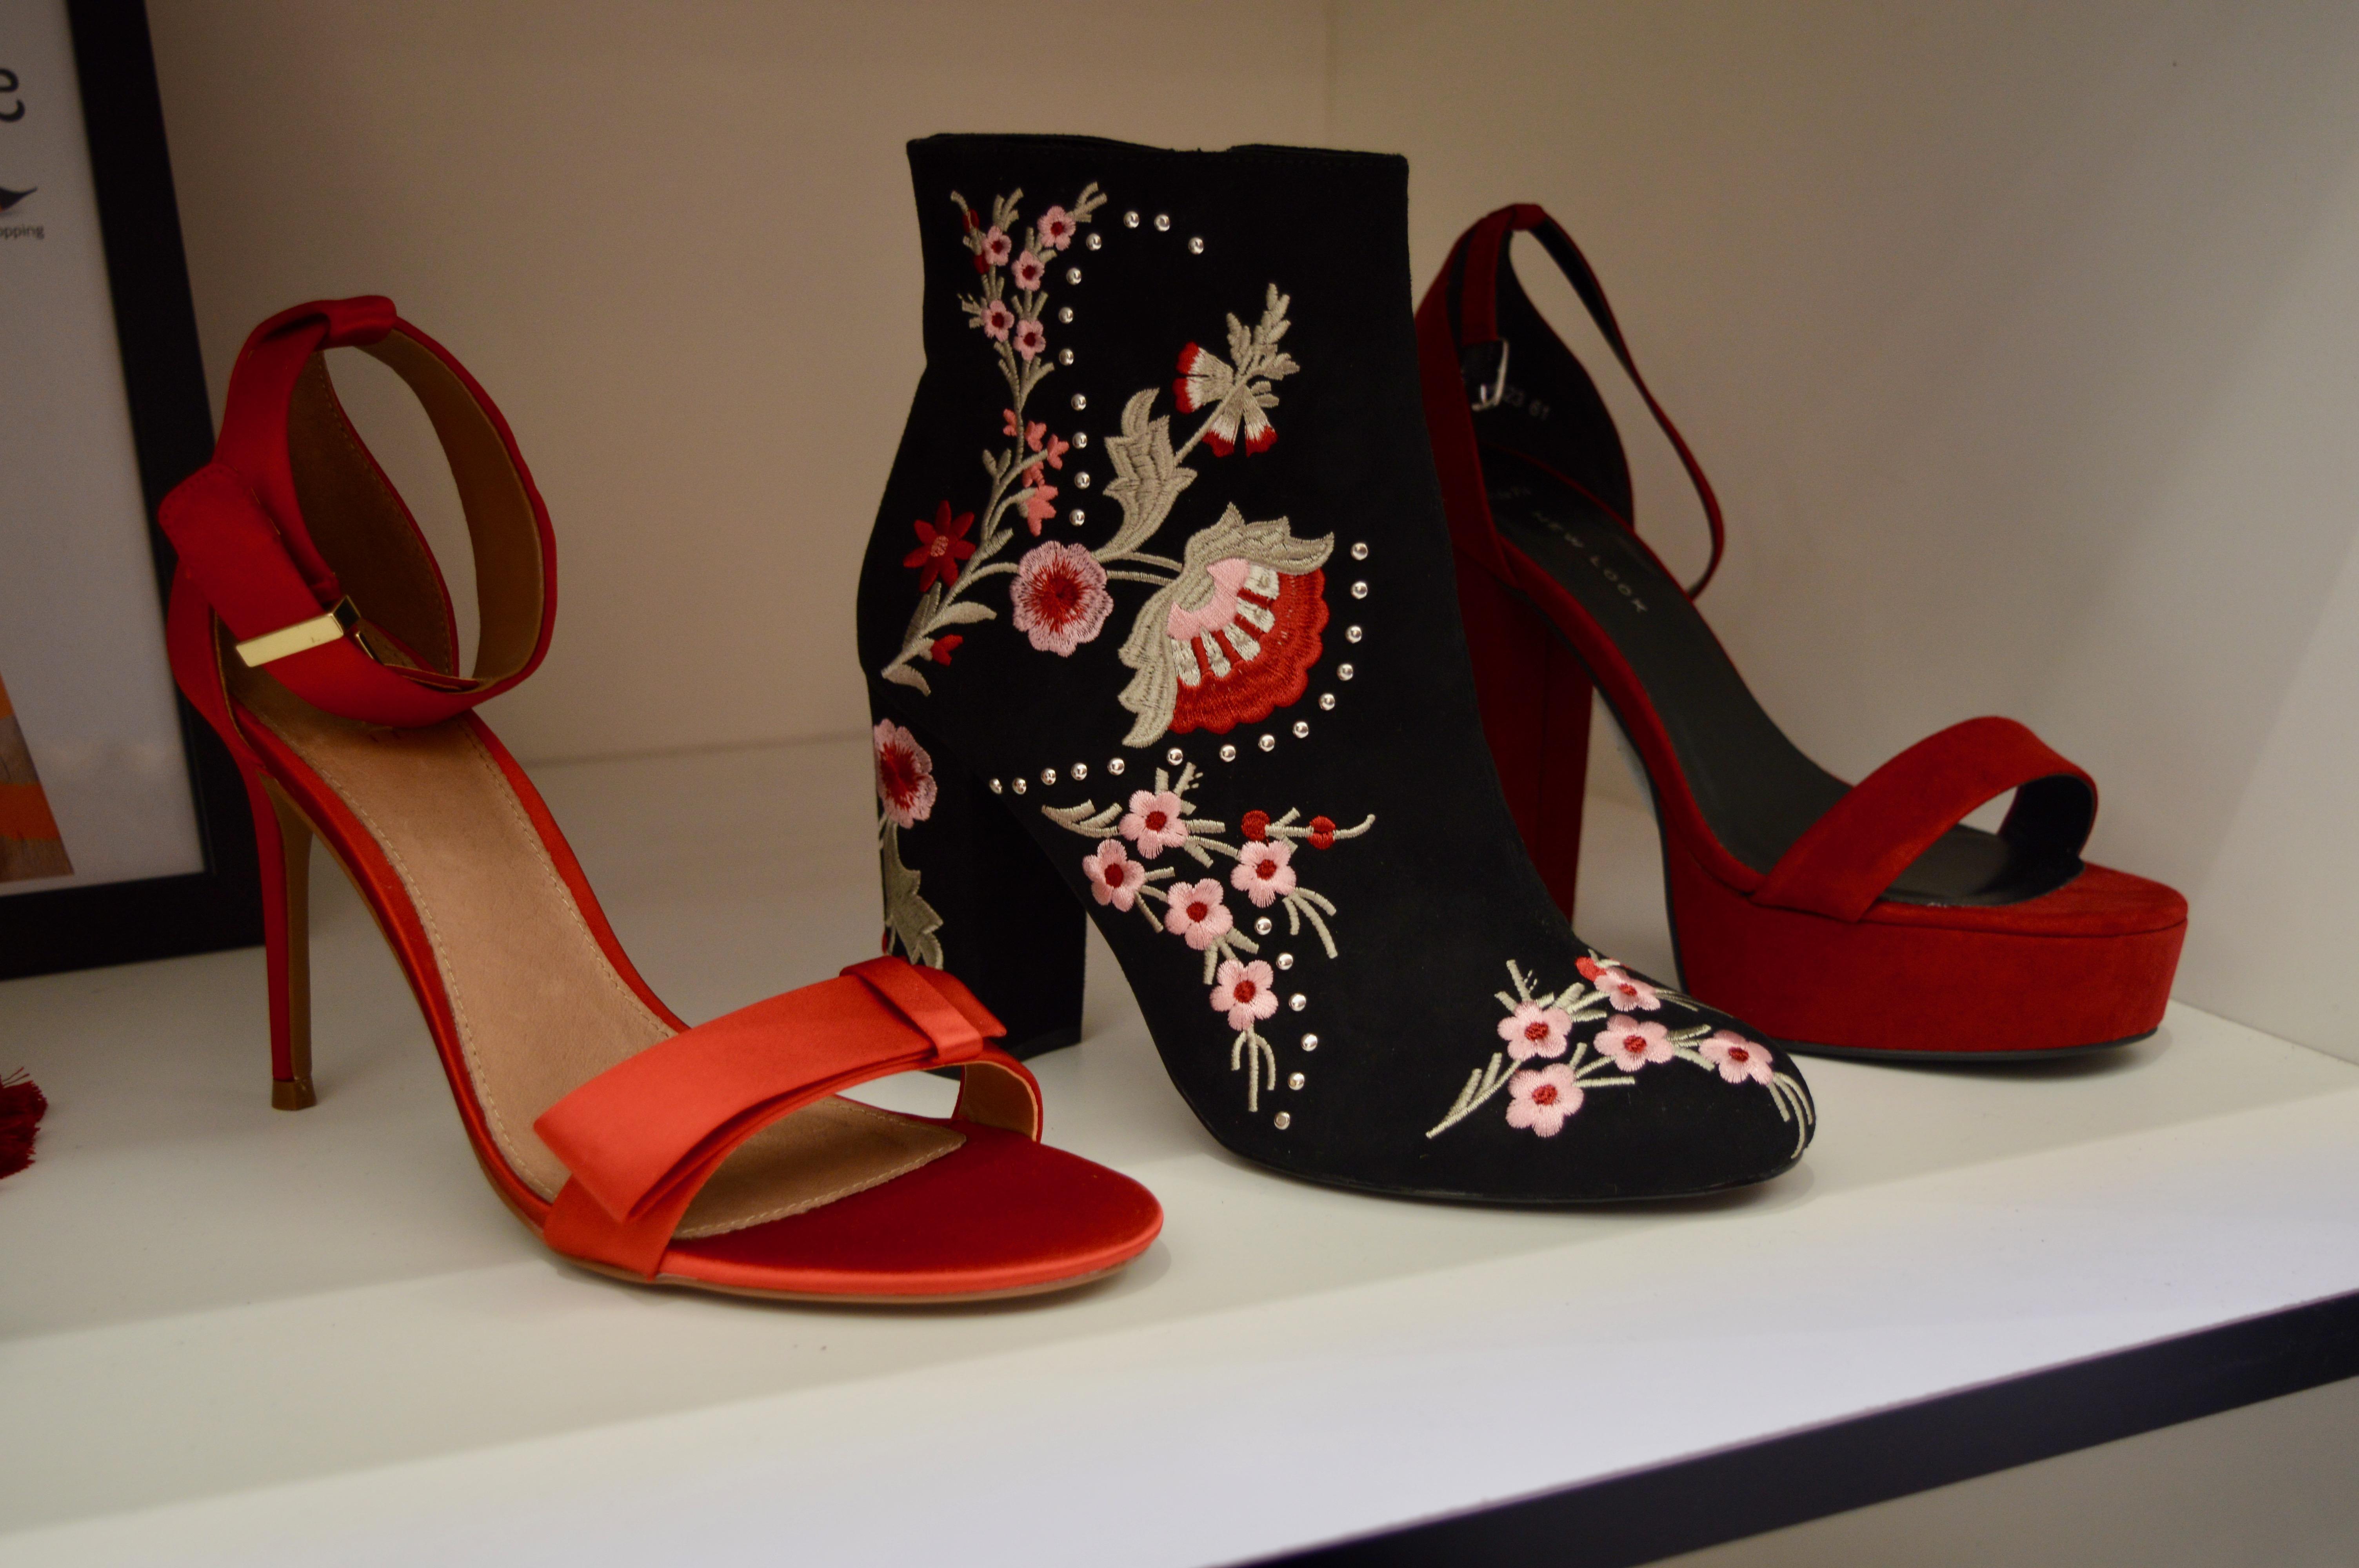 red-boots-intu-eldon-square-winter-fashion-stylissimo-newcastle-high-street-halloween-elle-blonde-luxury-lifestyle-destination-blog